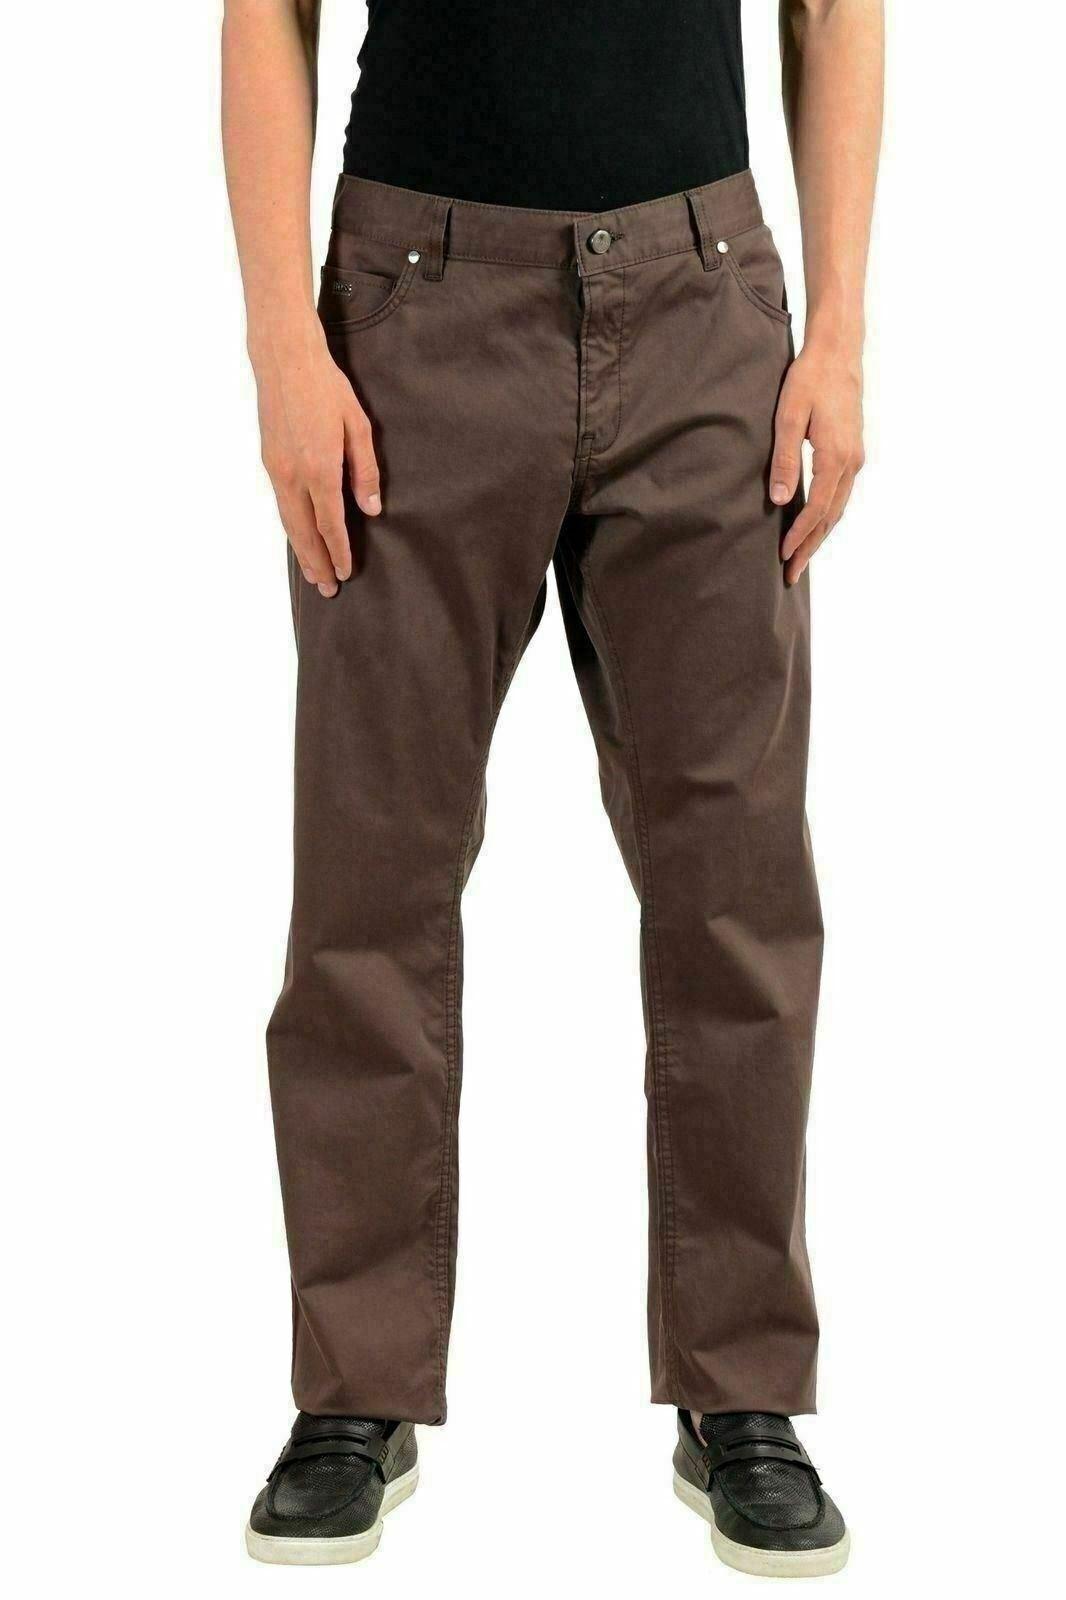 Hugo Boss Delaware1-7- Uomo Marronee Elasticizzato Slim Jeans Us 40 32 It 40